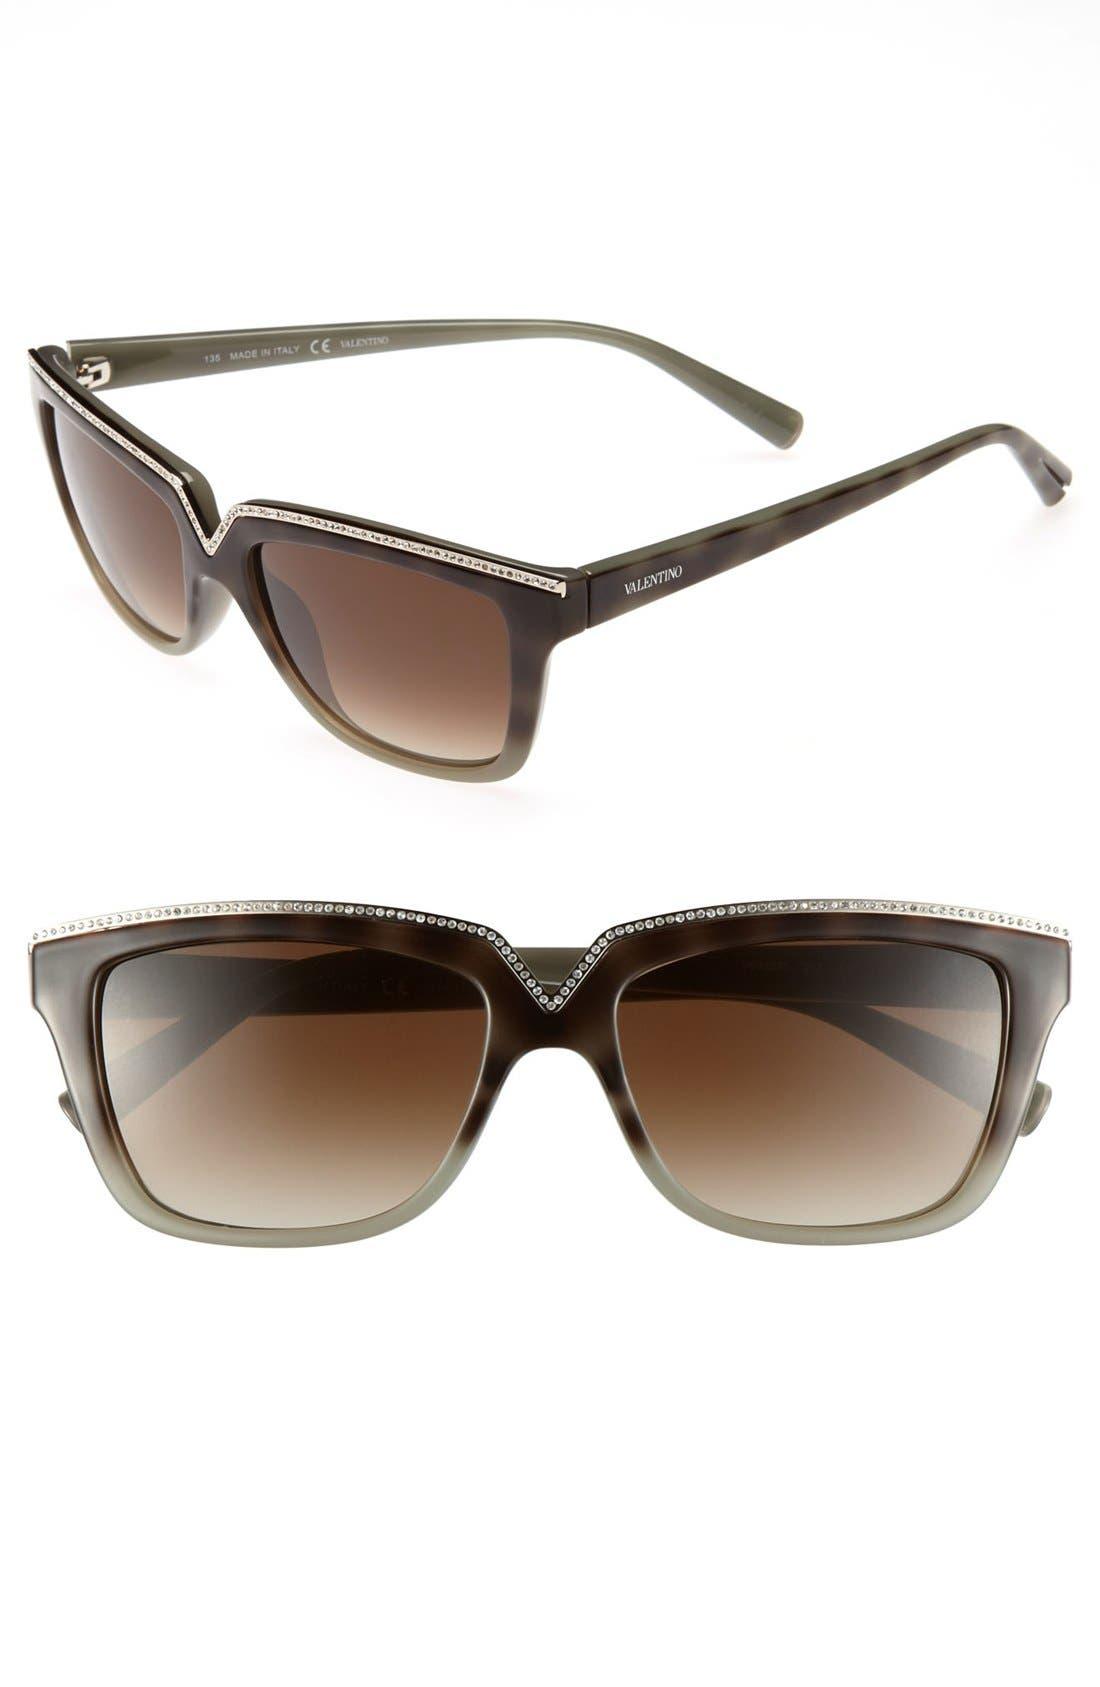 Alternate Image 1 Selected - Valentino 53mm Retro Sunglasses